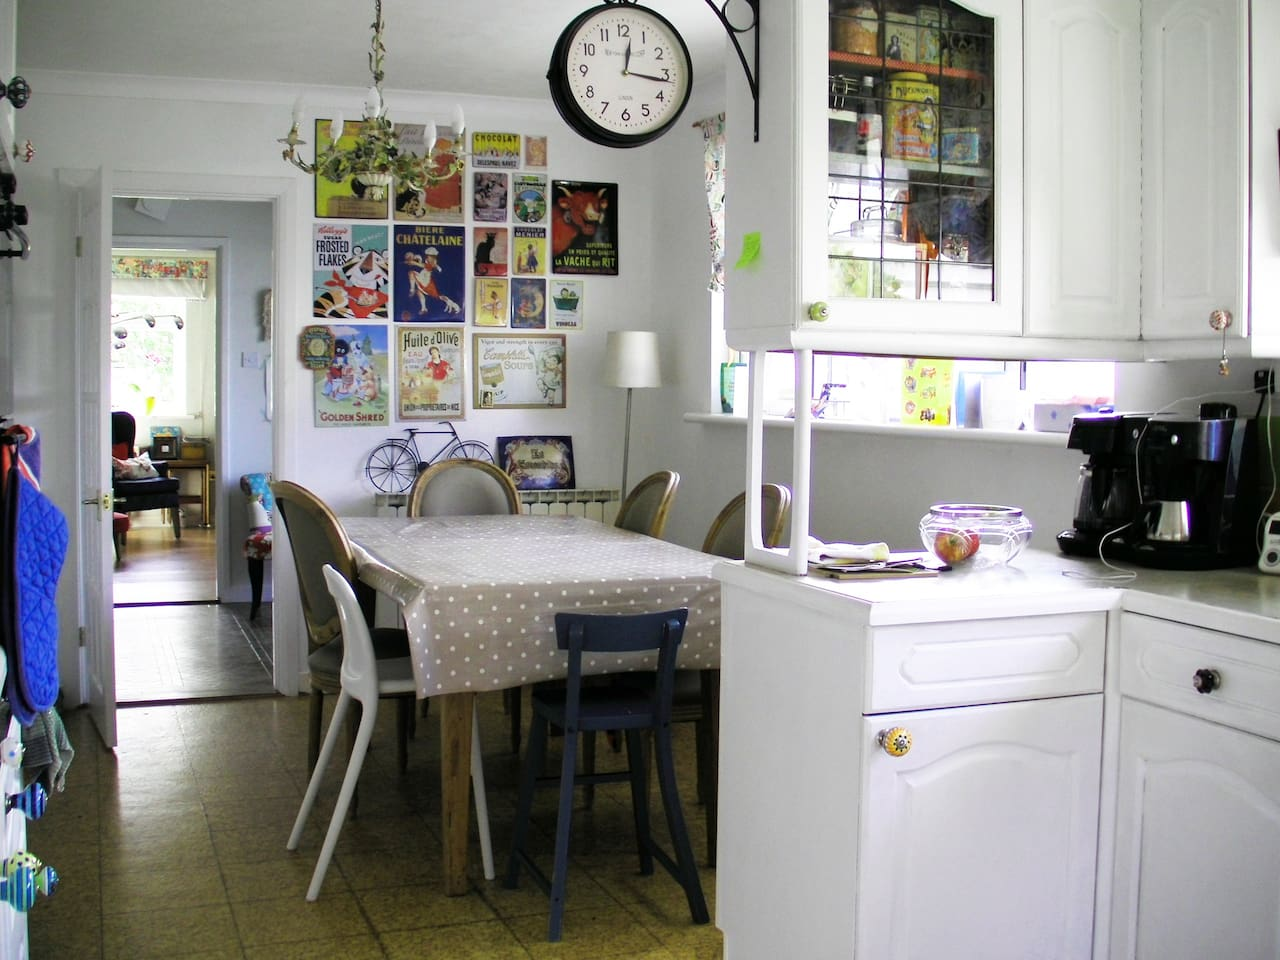 Kitchen eating area.